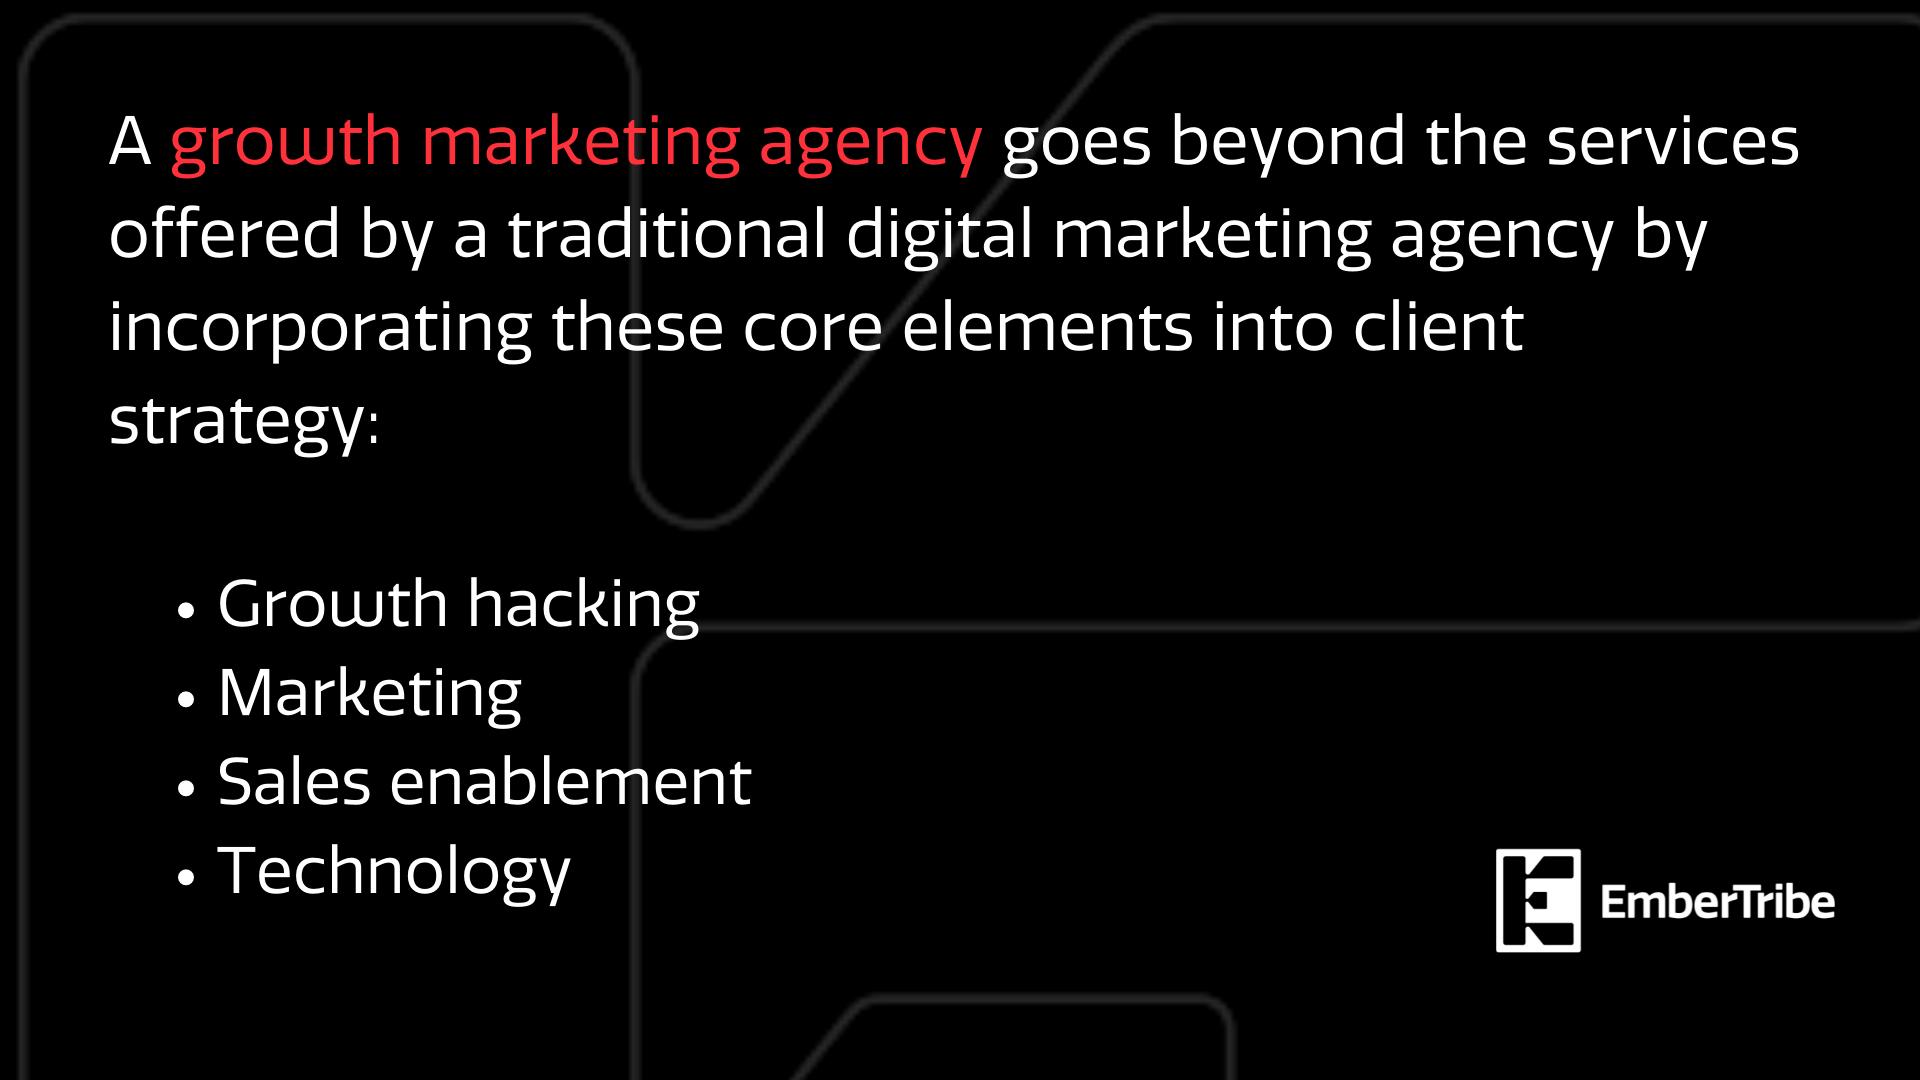 Growth marketing agencies go beyond traditional marketing